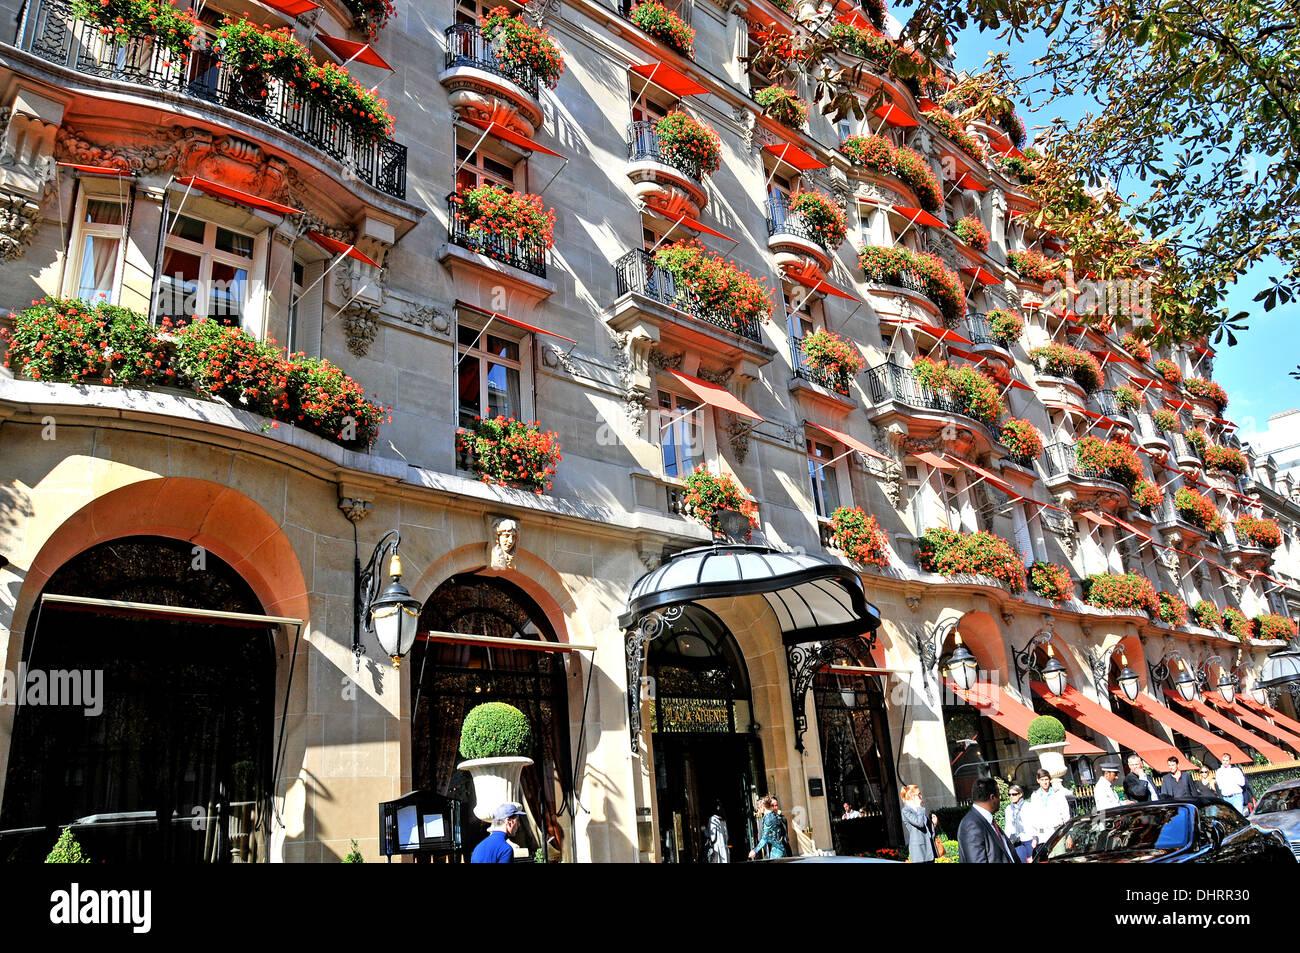 Plaza Athen U00e9e Palace Hotel Montaigne Avenue Paris France